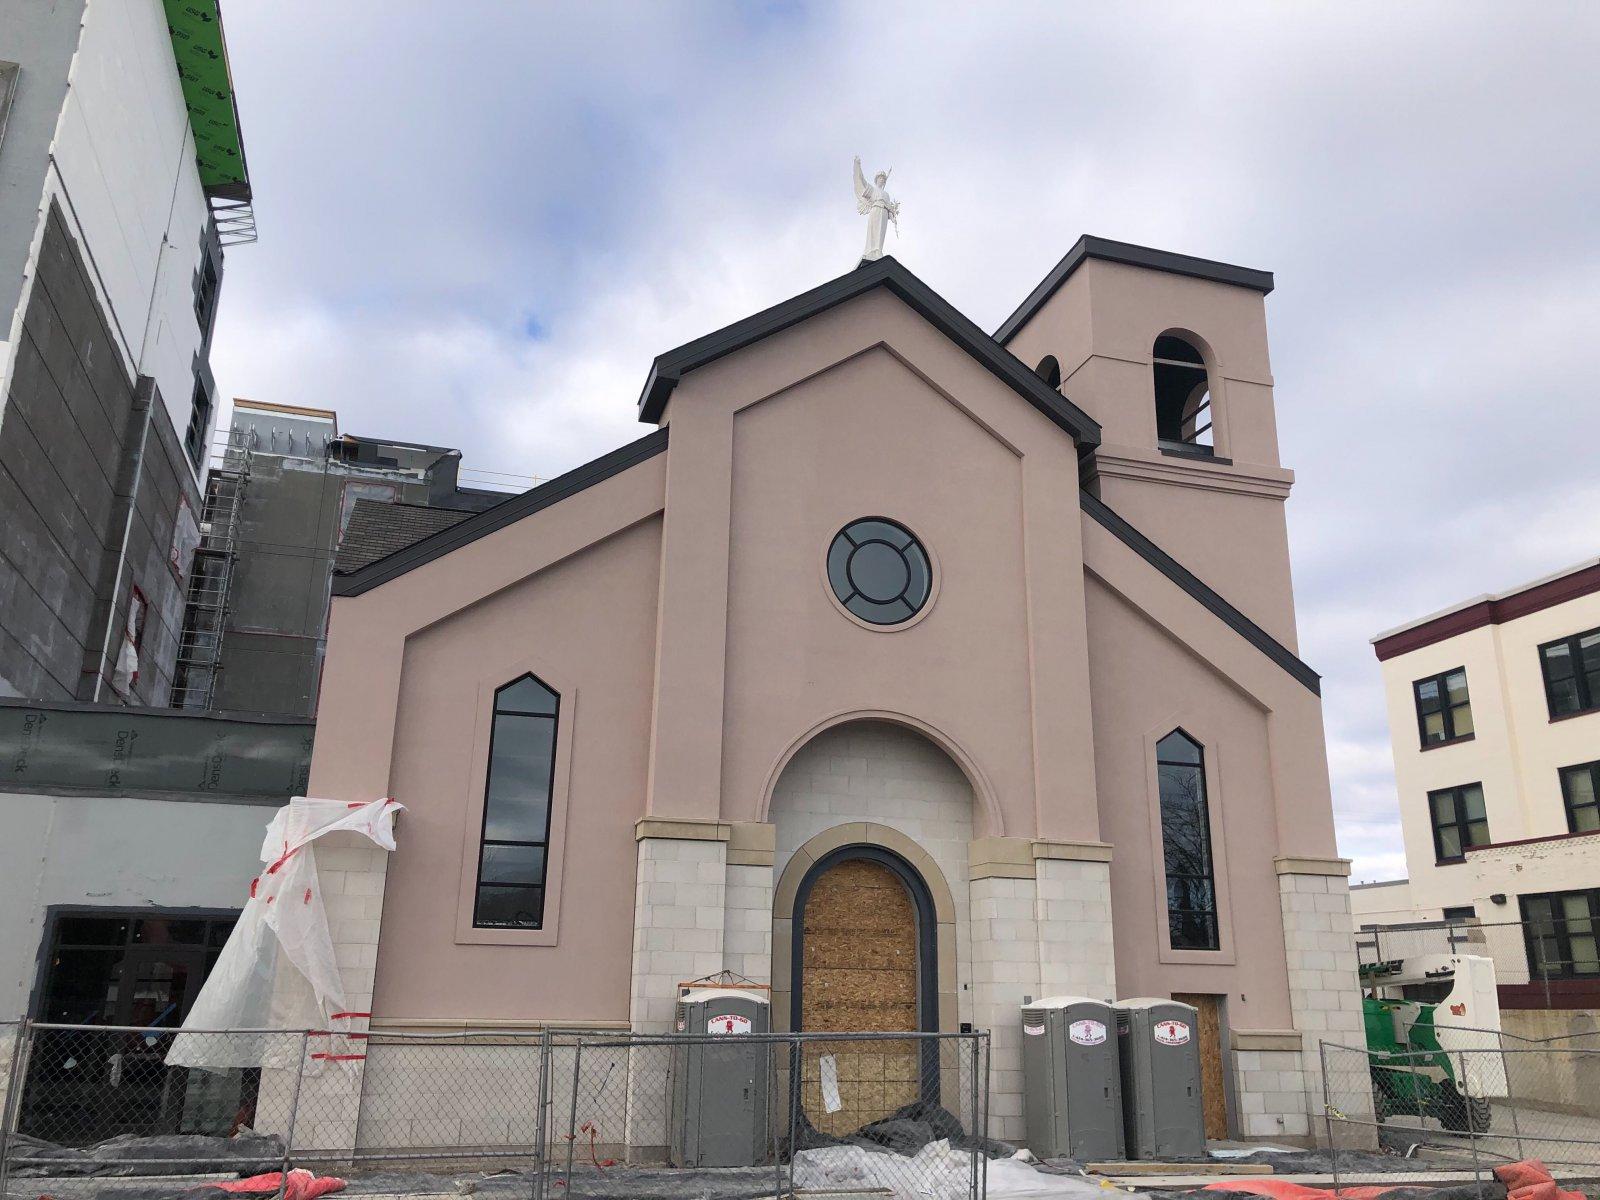 New St. Rita Church